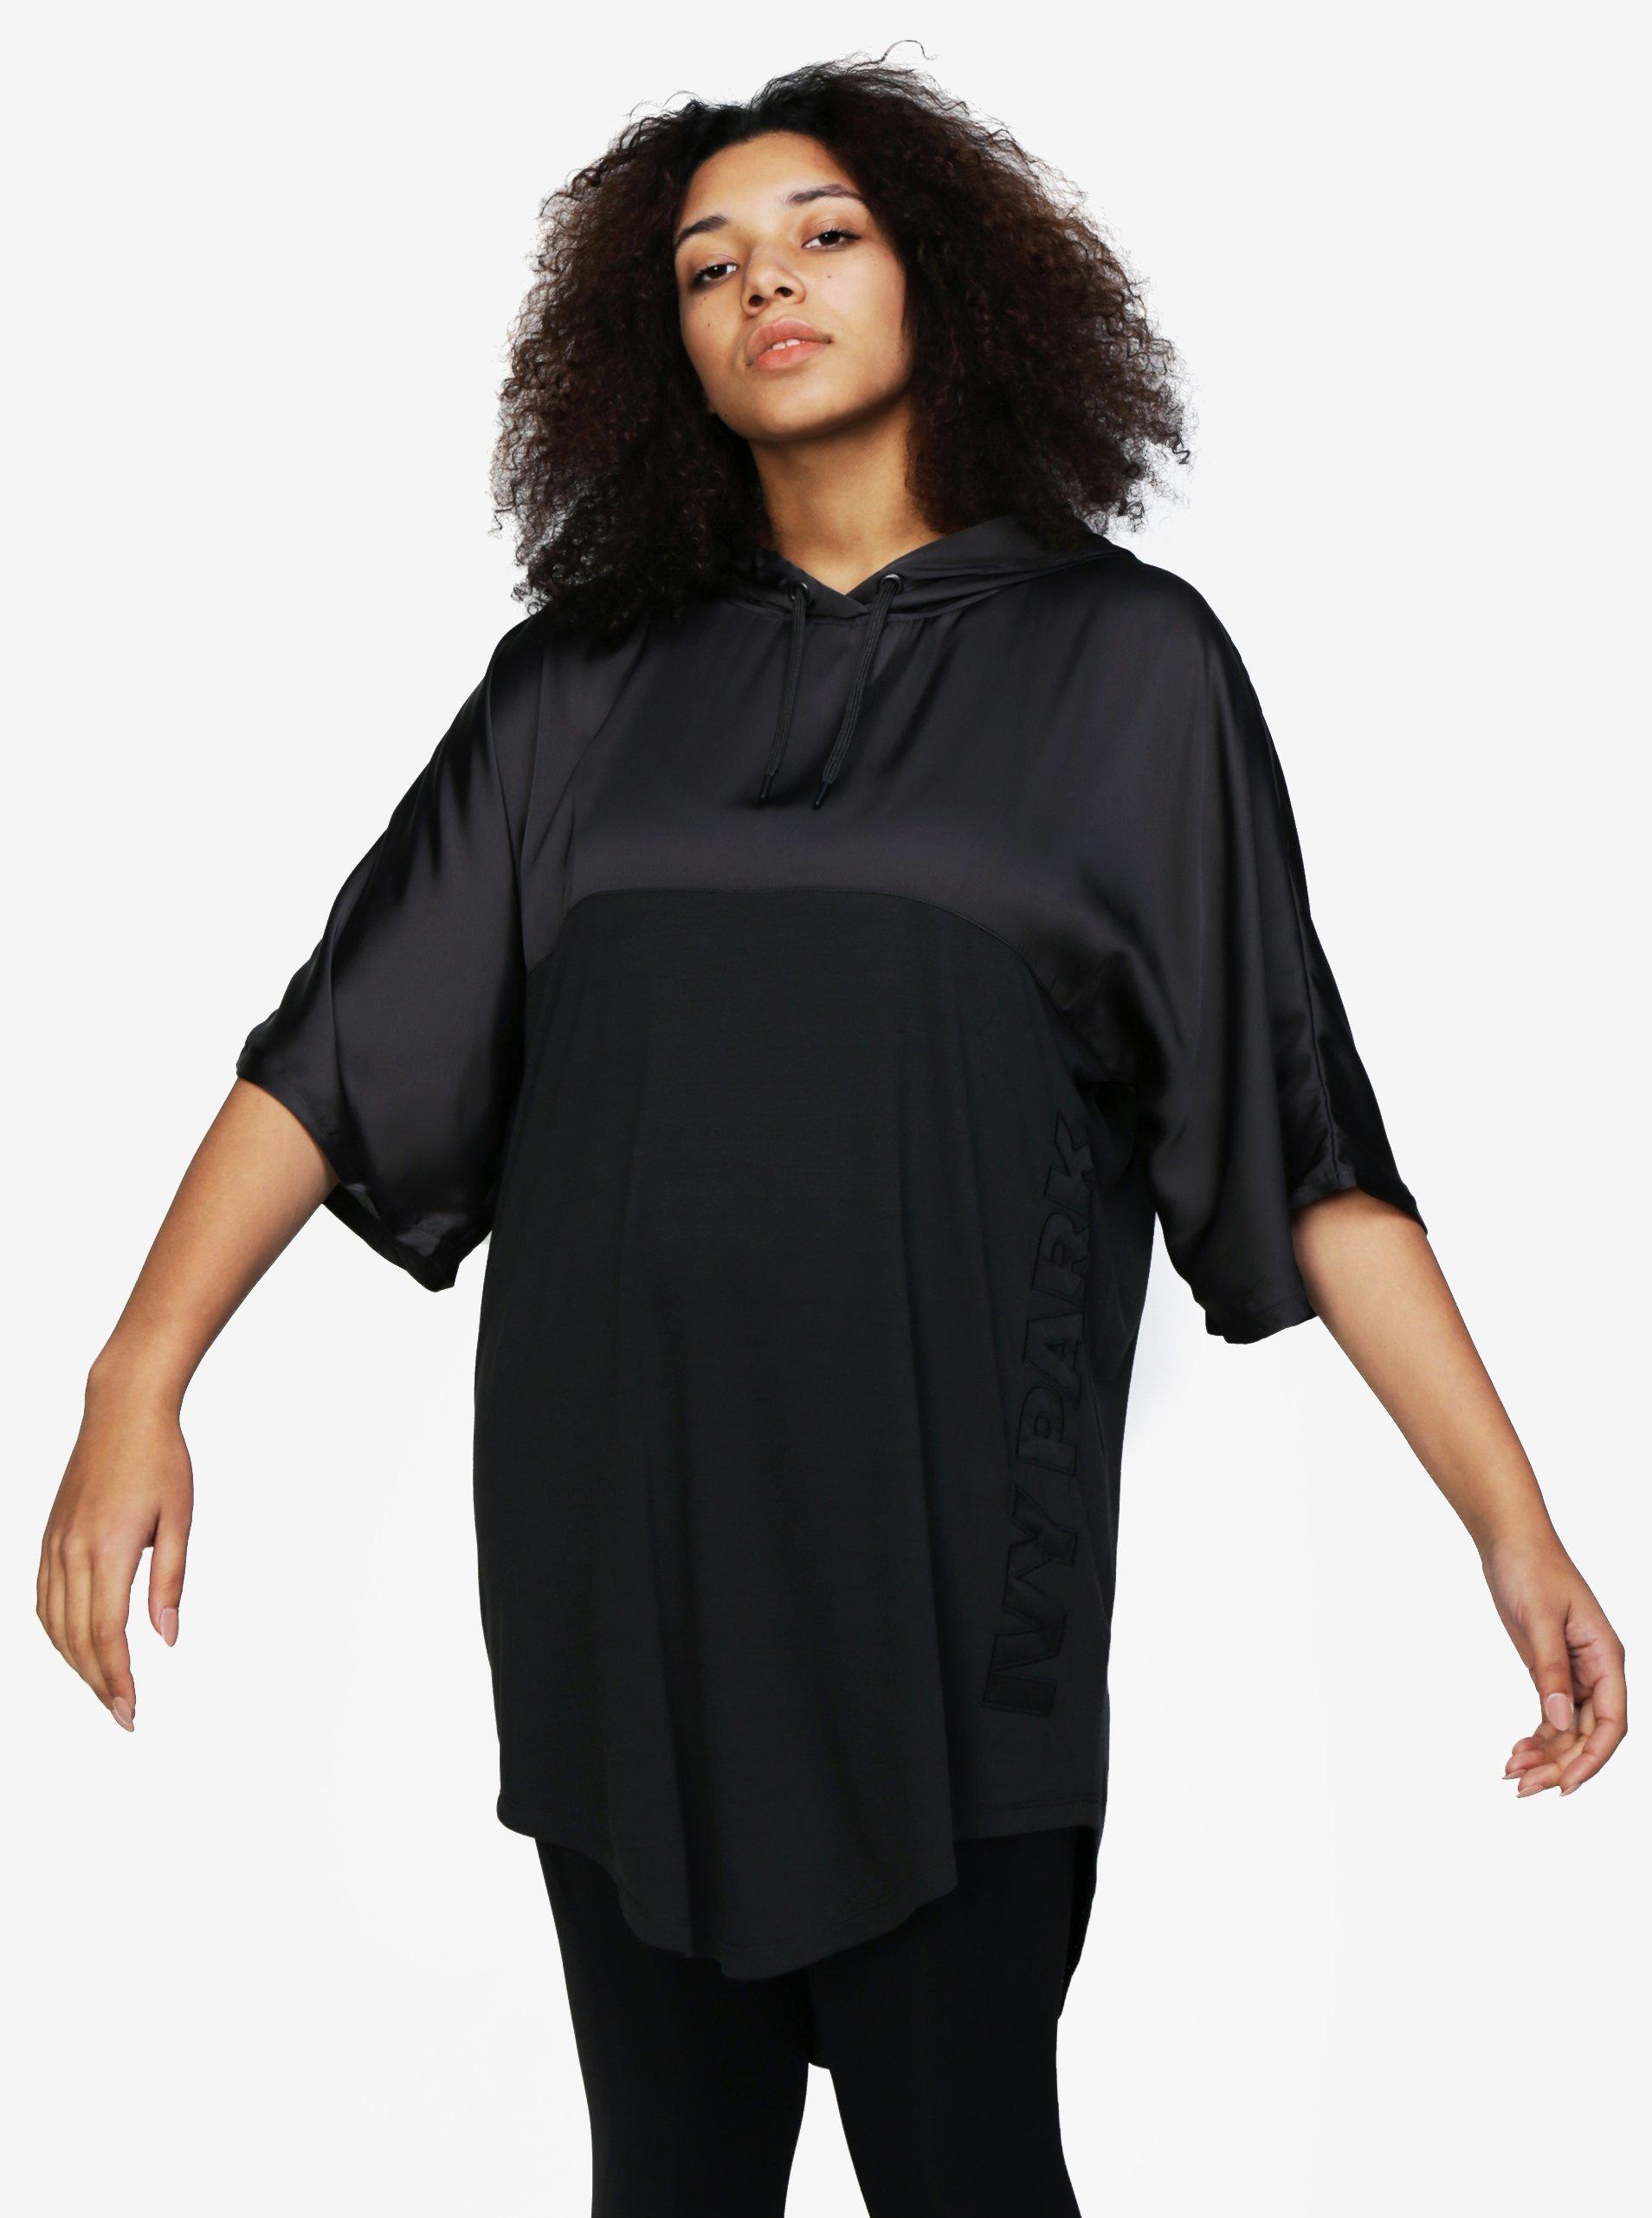 5bfa216a0c08 Čierne dlhé oversize tričko s kapucňou Ivy Park